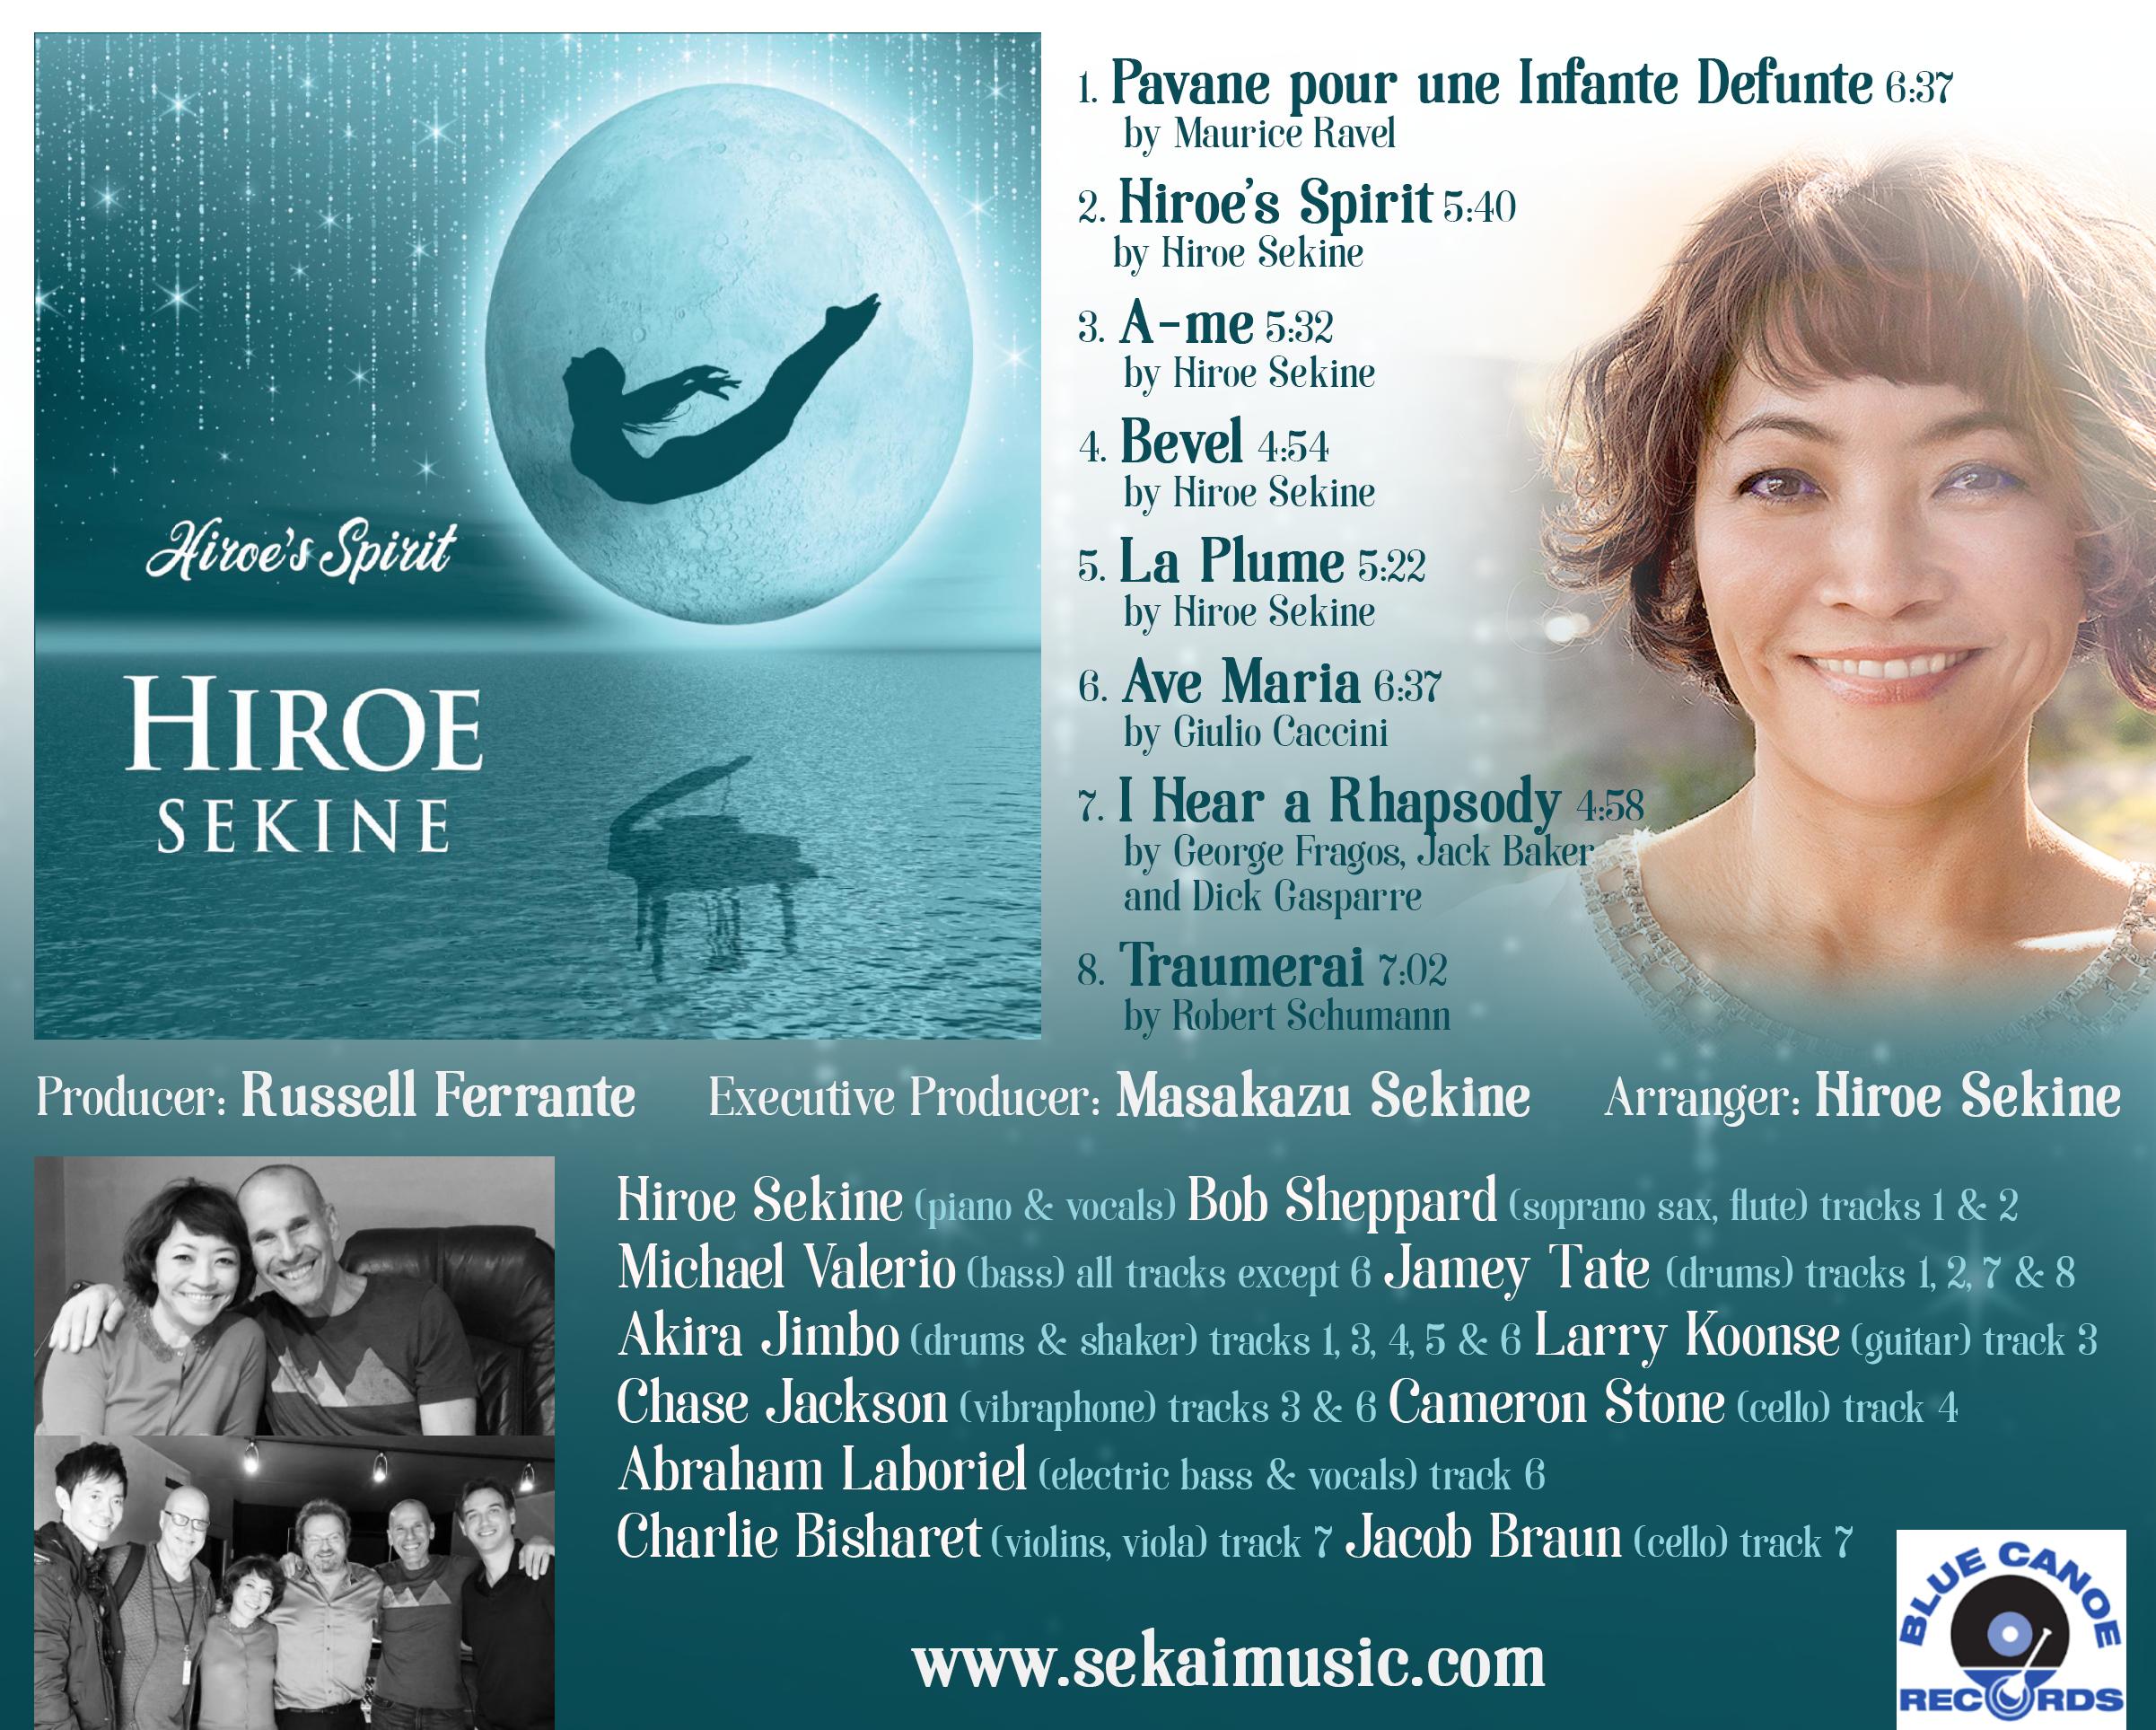 Email_Hiroe Sekine - Hiroe's Spirit.png